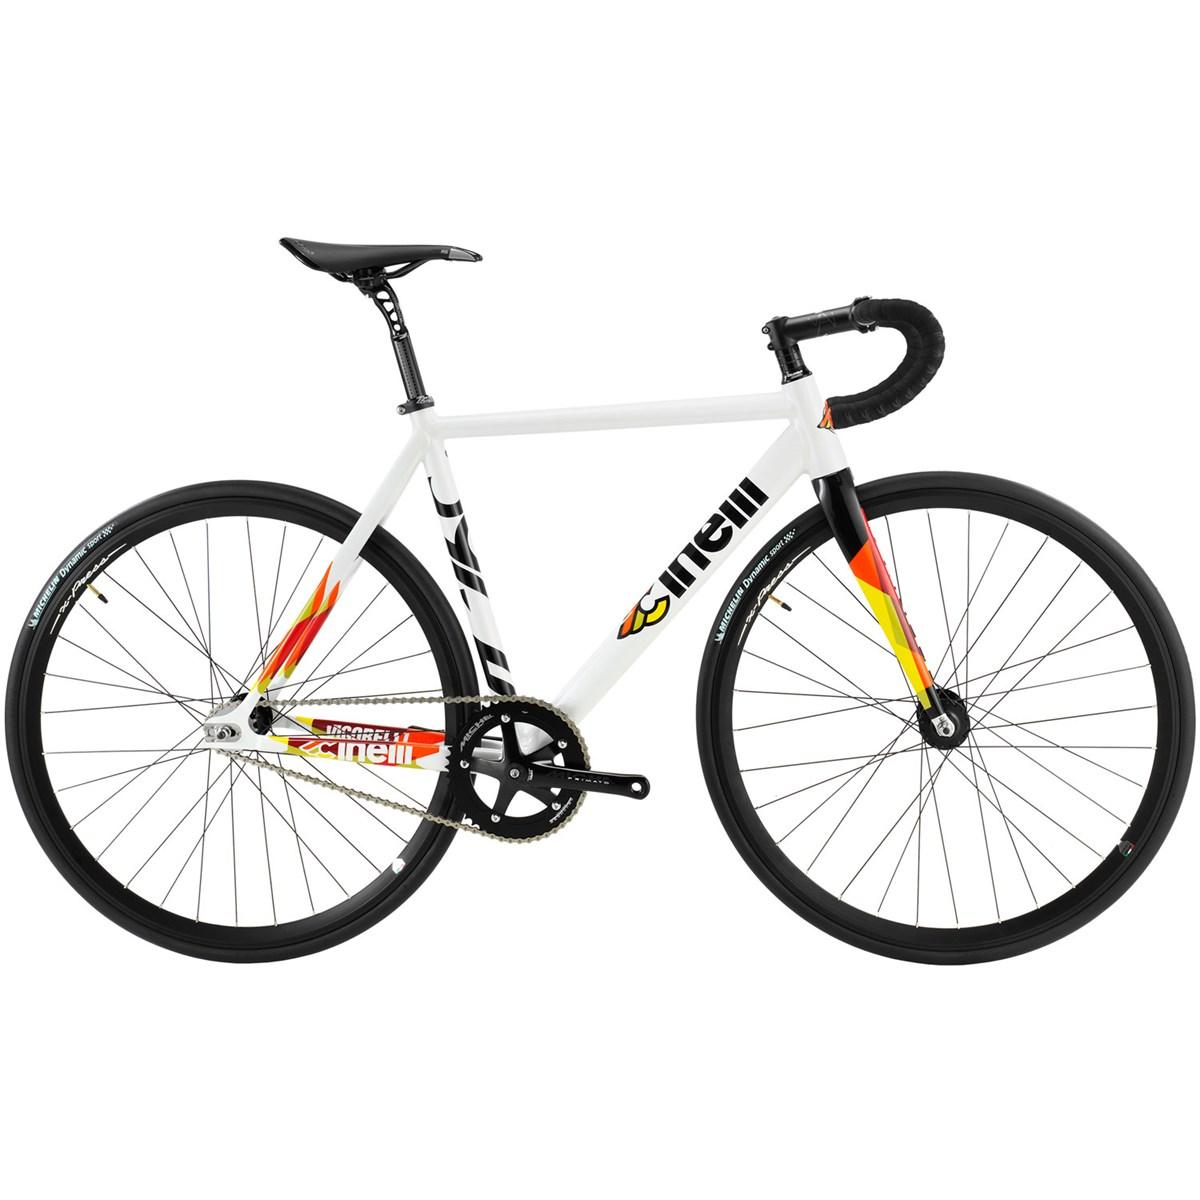 Cinelli Vigorelli Aluminium 2018 Singlespeed/ Track/ Fixed Bike ...